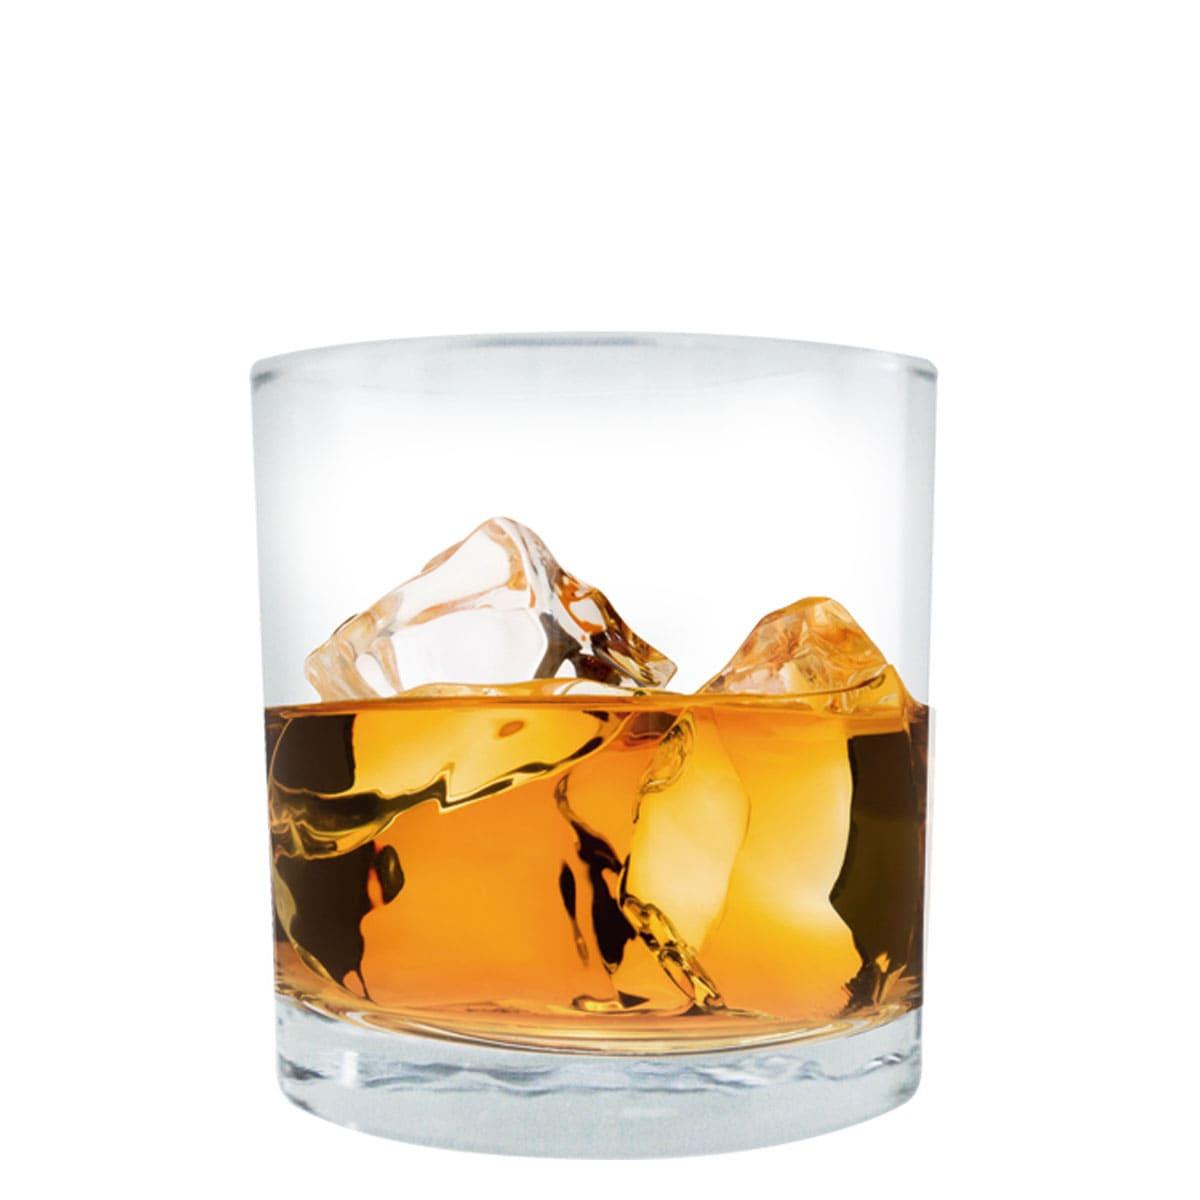 Copo de Whisky Prestige On The Rocks Vidro 335ml R$7.17 a unid. (Caixa com 24 unidades)